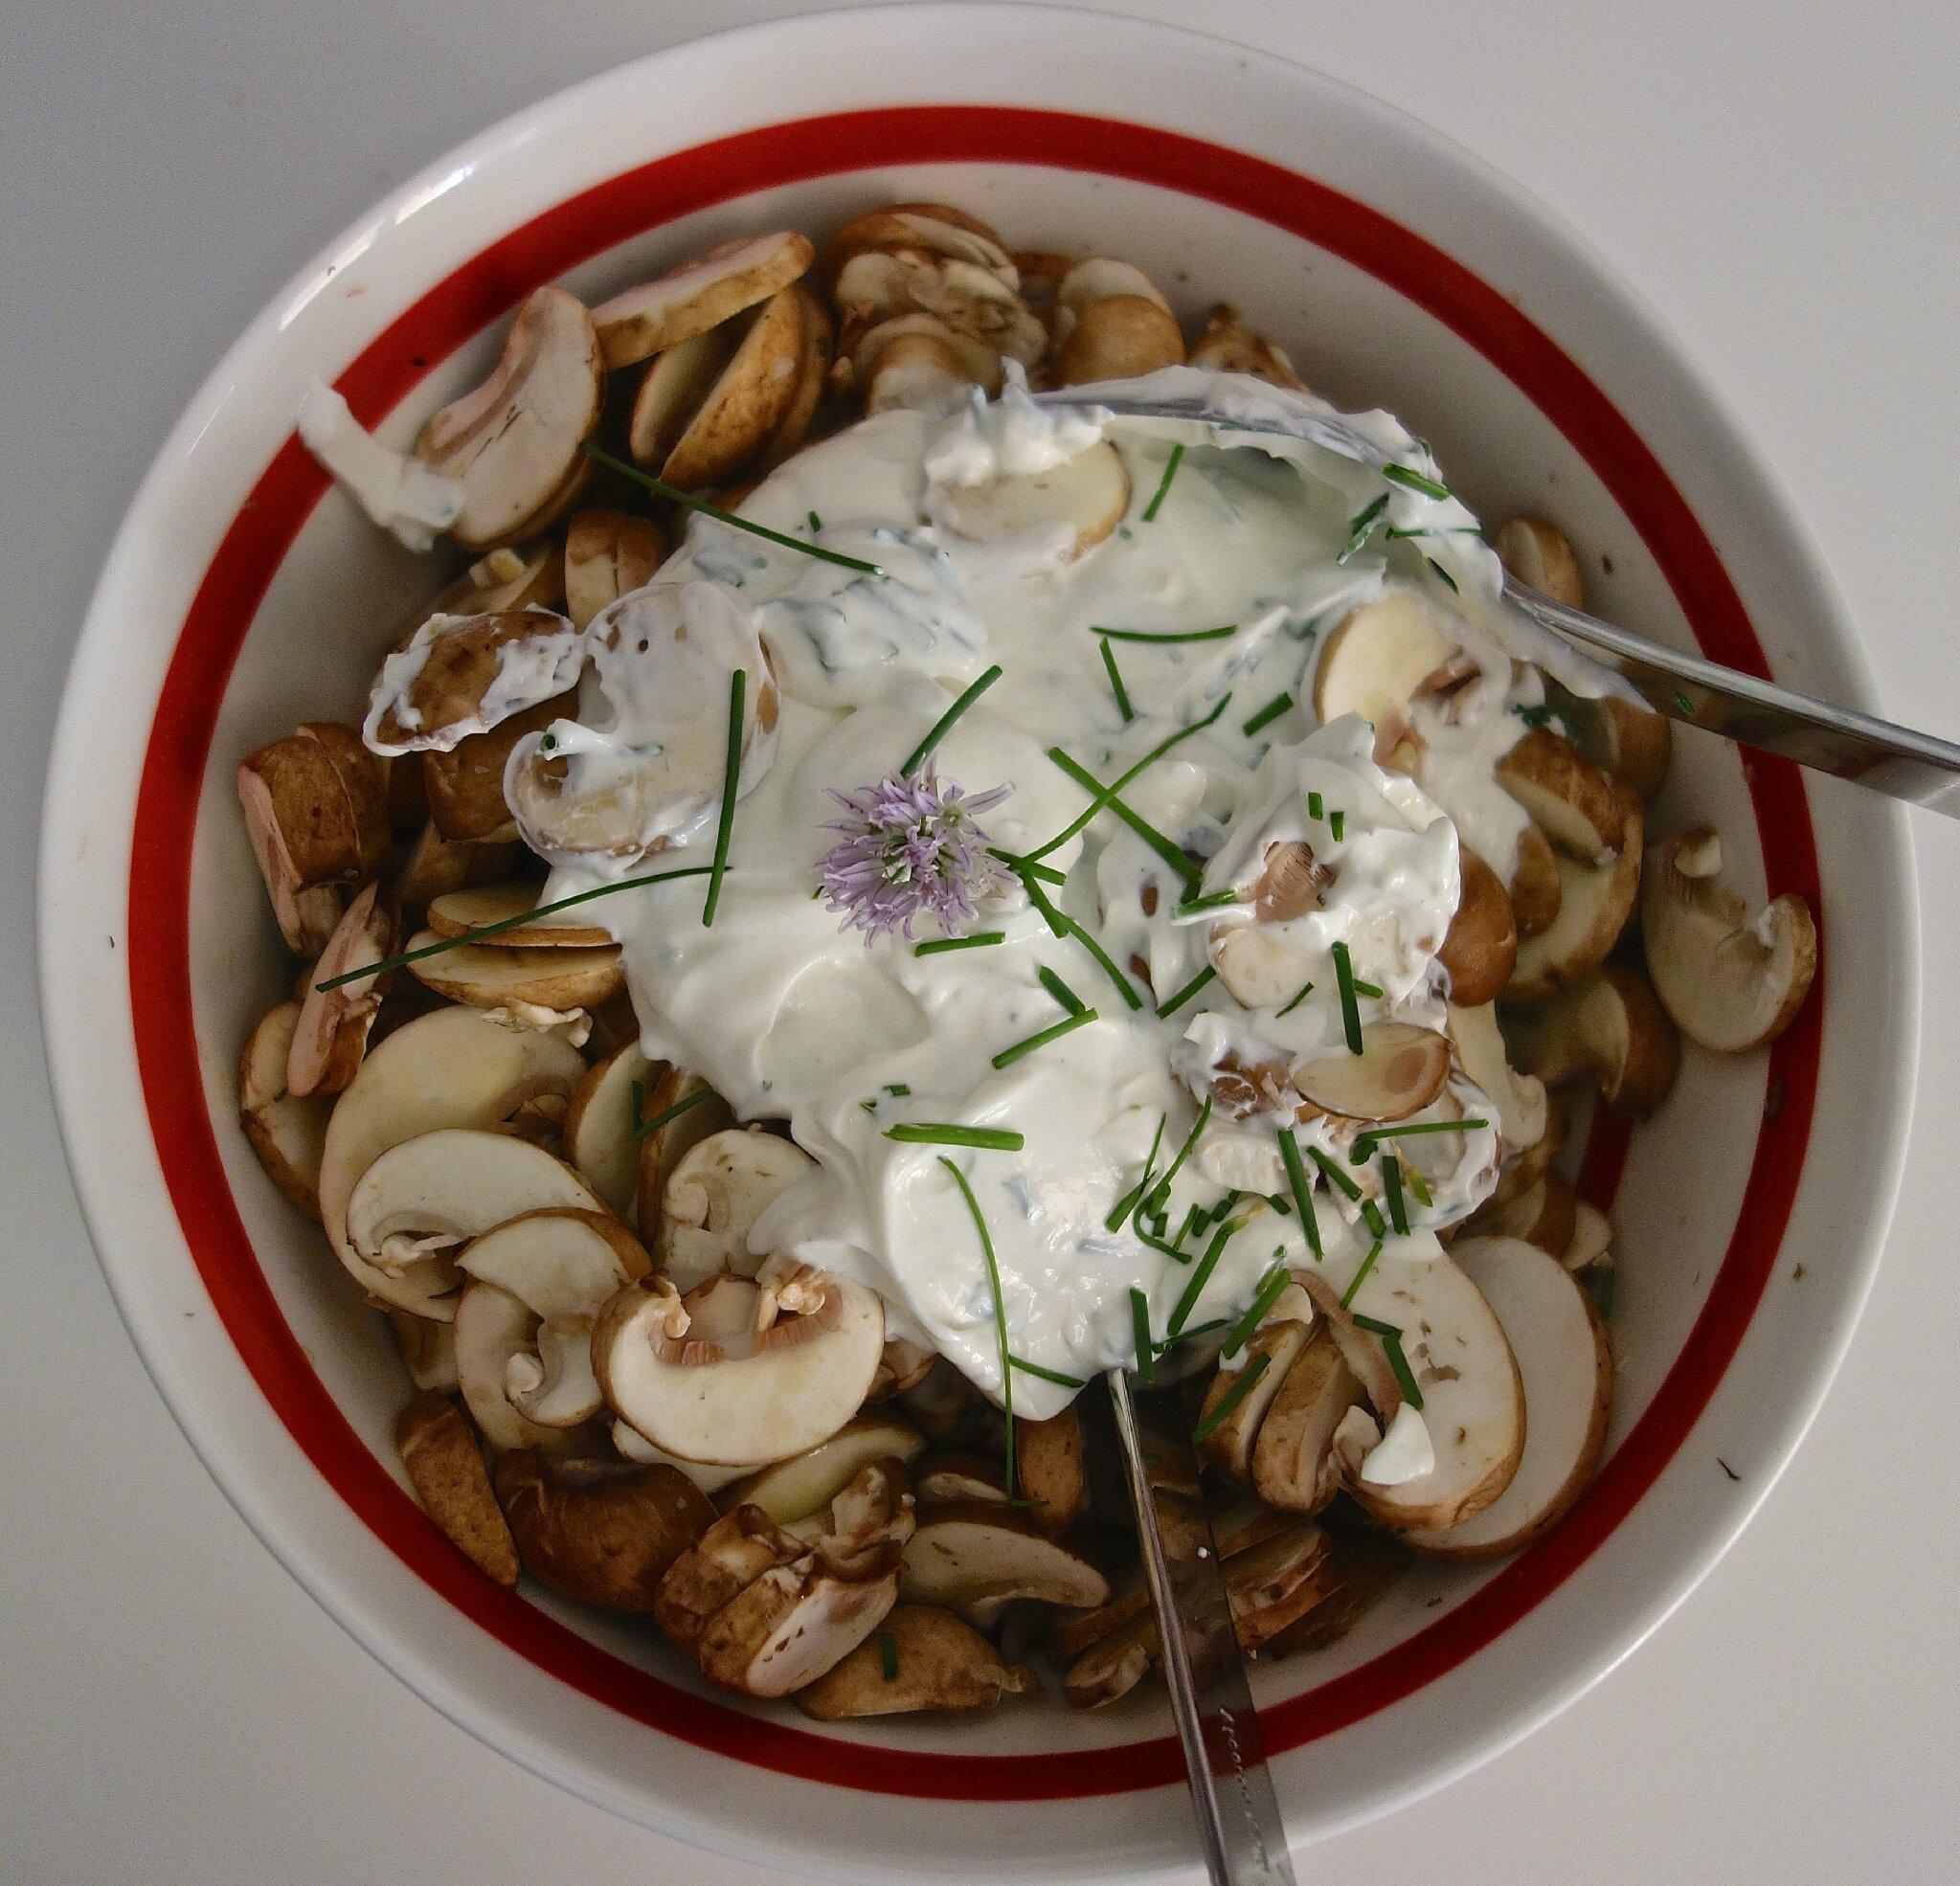 Salade de champignons de paris frais de dame vanille menus propos - Salade de champignons frais ...